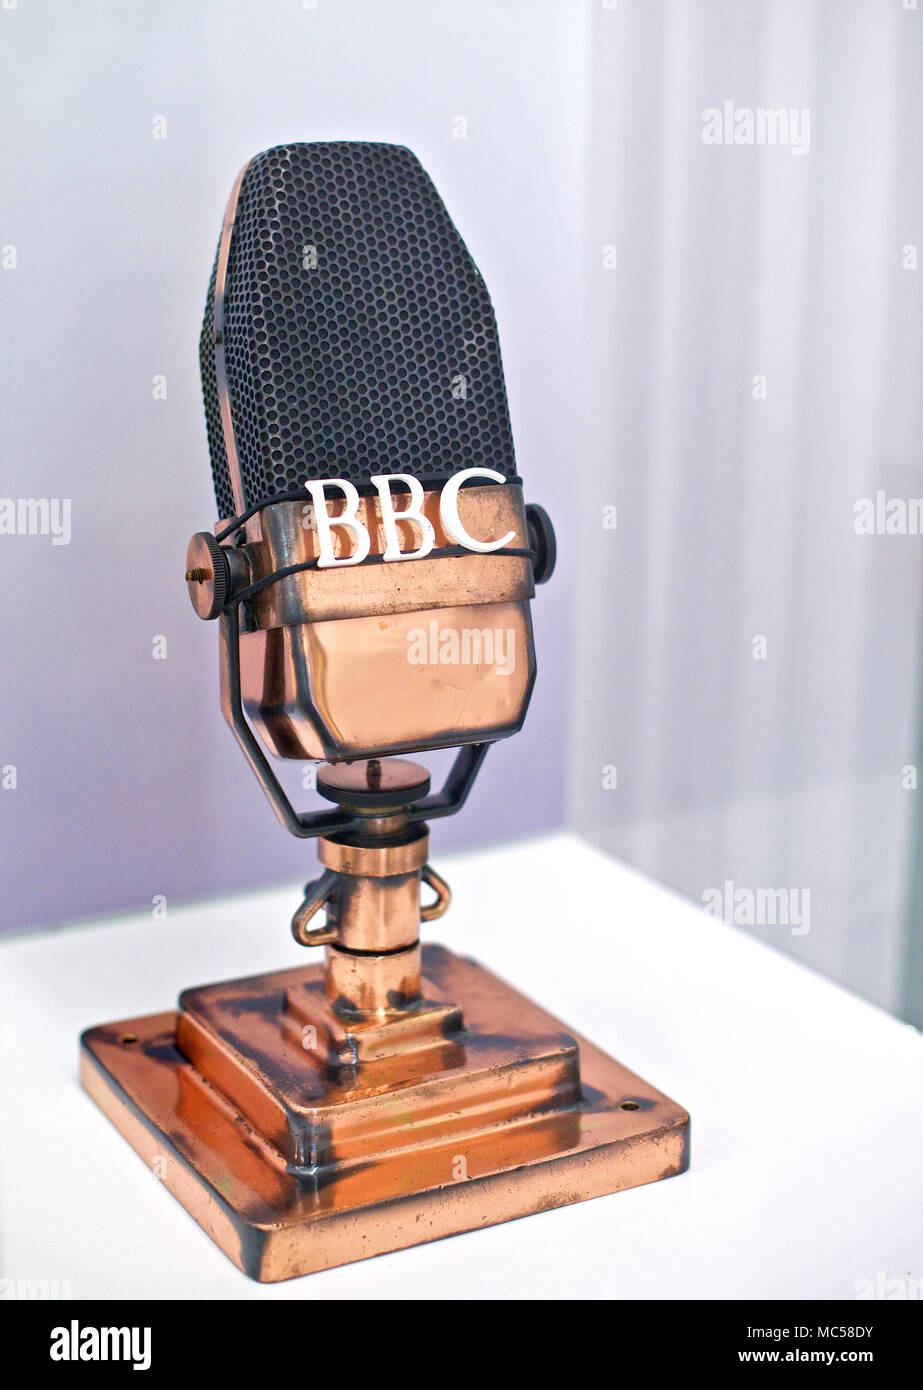 BBC London - Stock Image